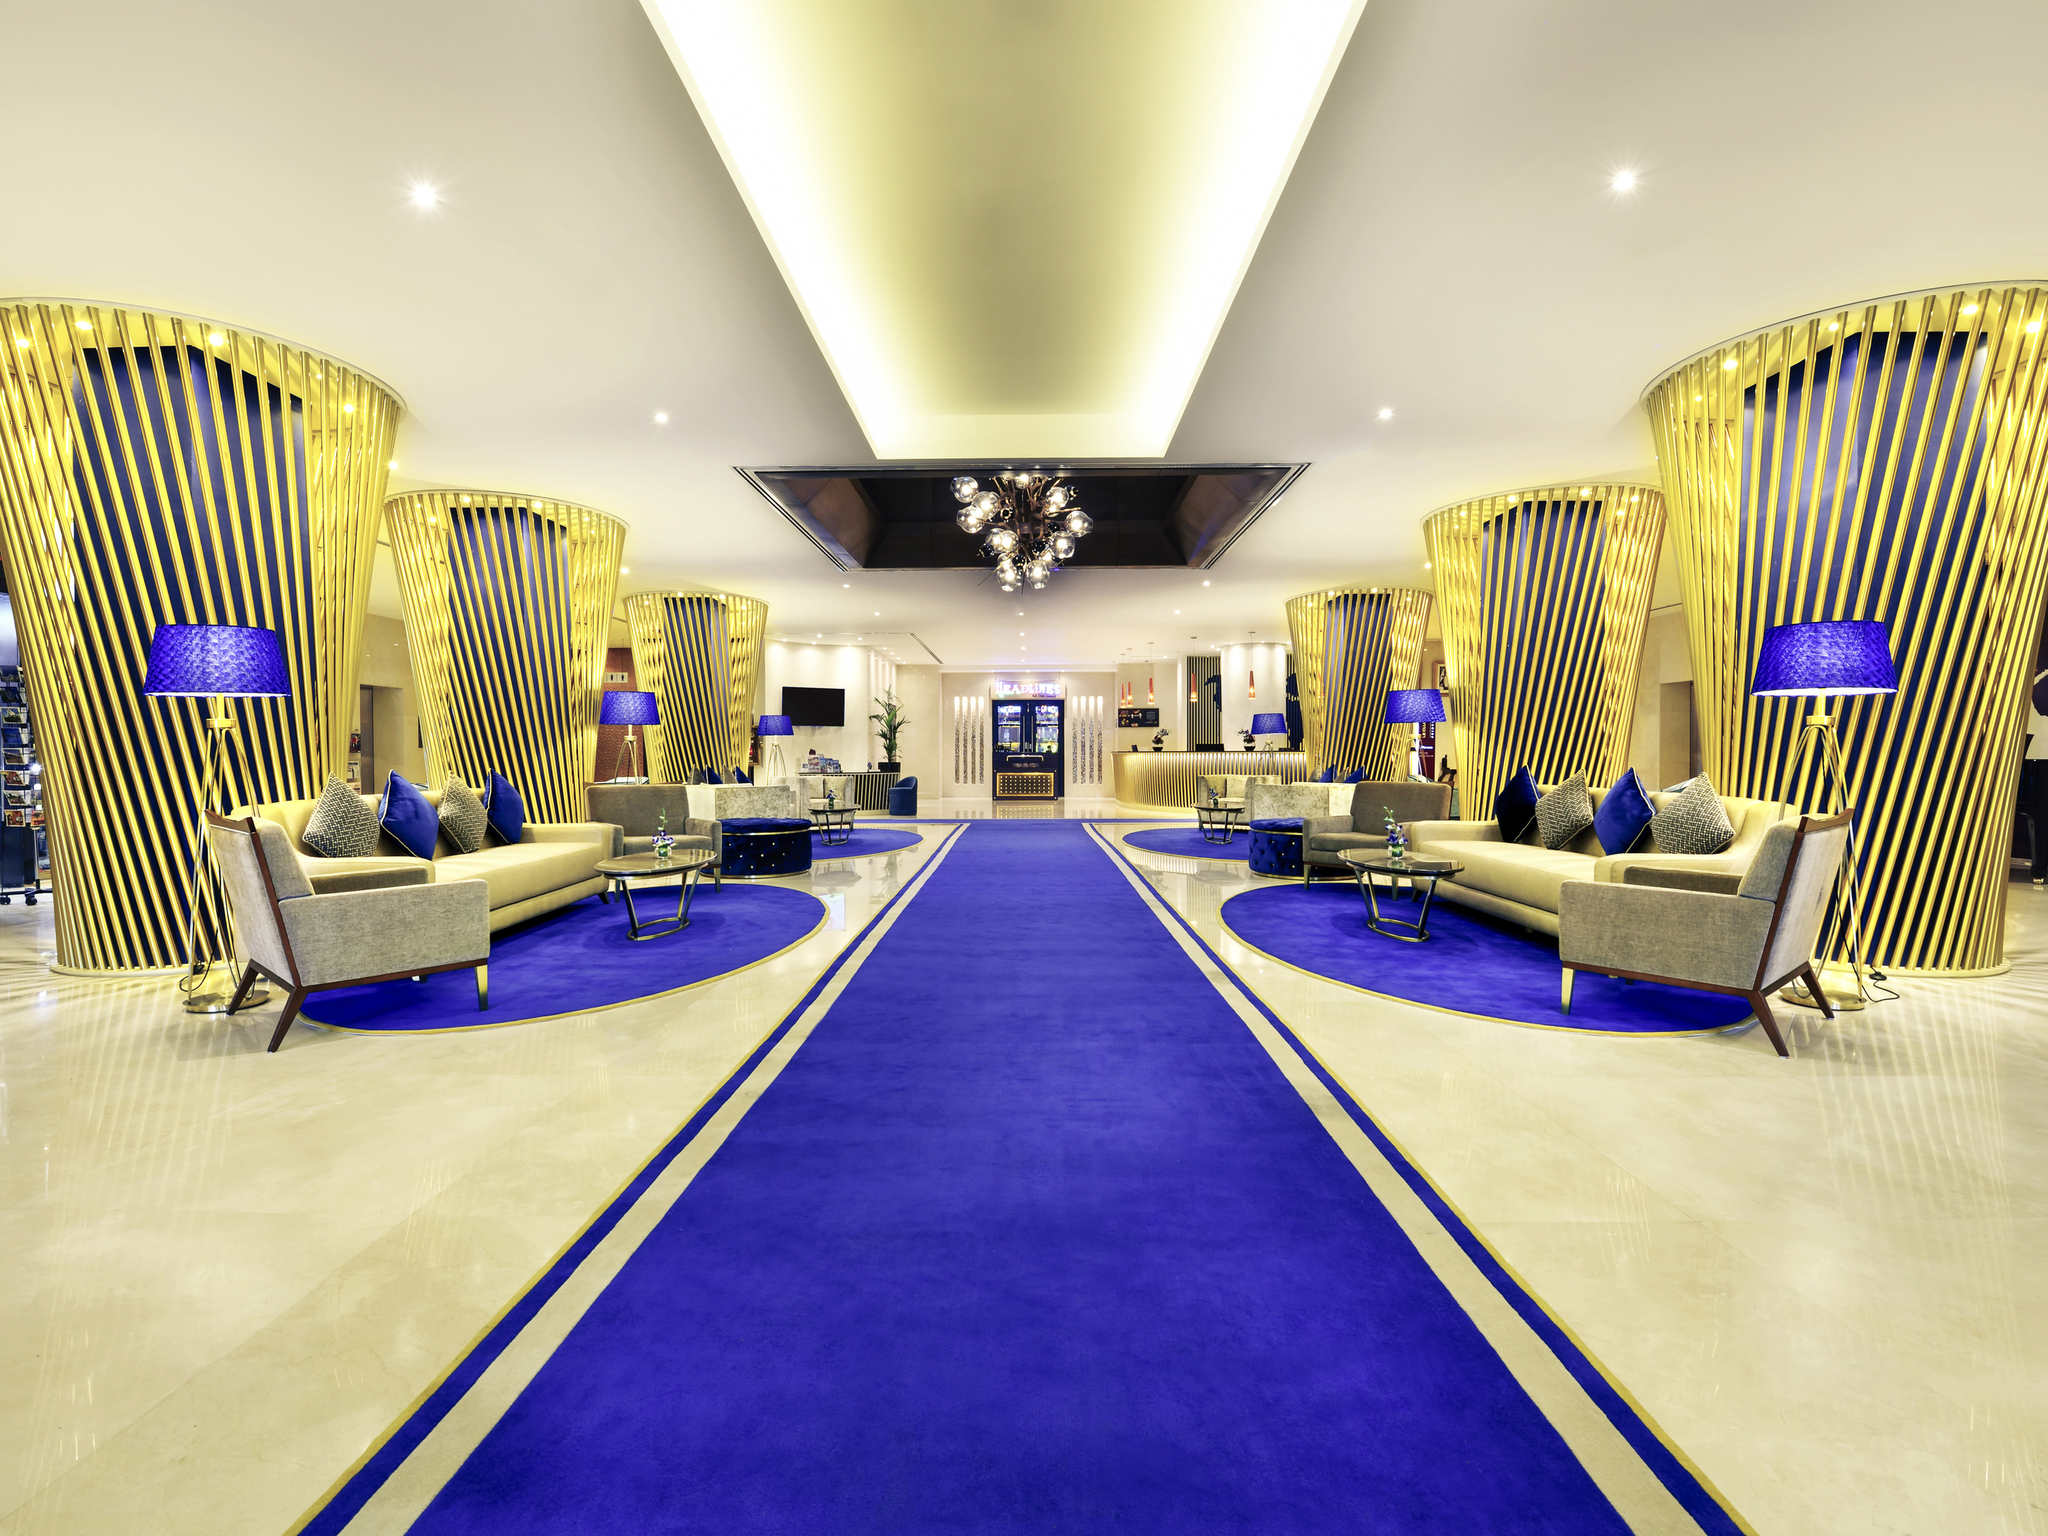 4 Star Hotel In Dubai Mercure Gold Al Mina Road Floor Pool Cleaning Diagram Including Printed Circuit Board